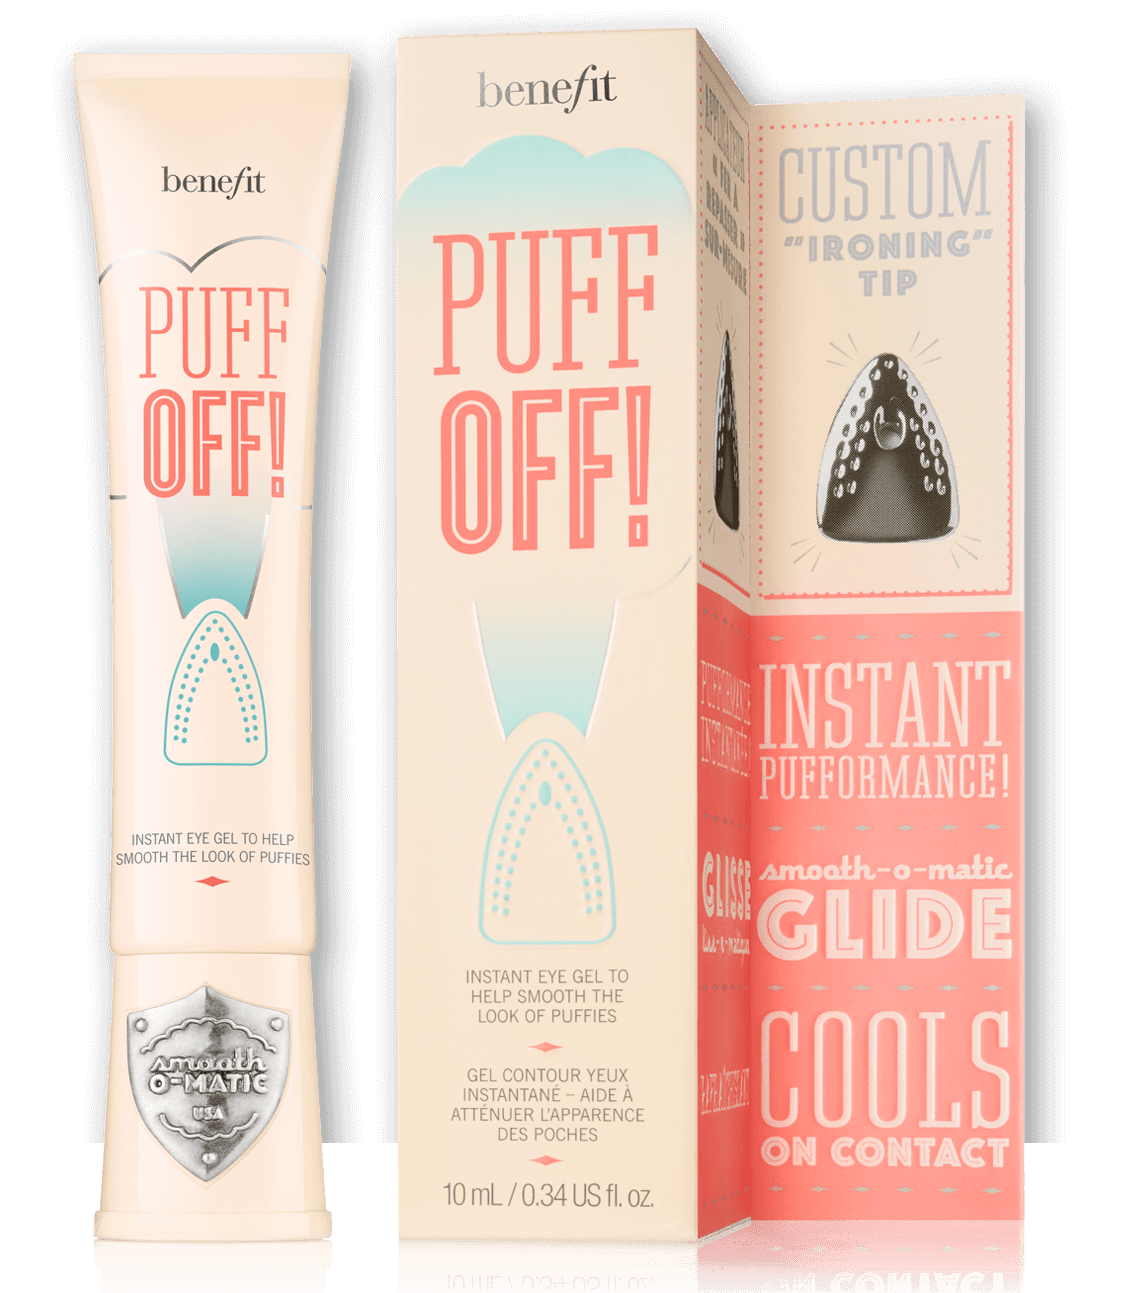 Benefit Cosmetics Puff Off! Under Eye Gel